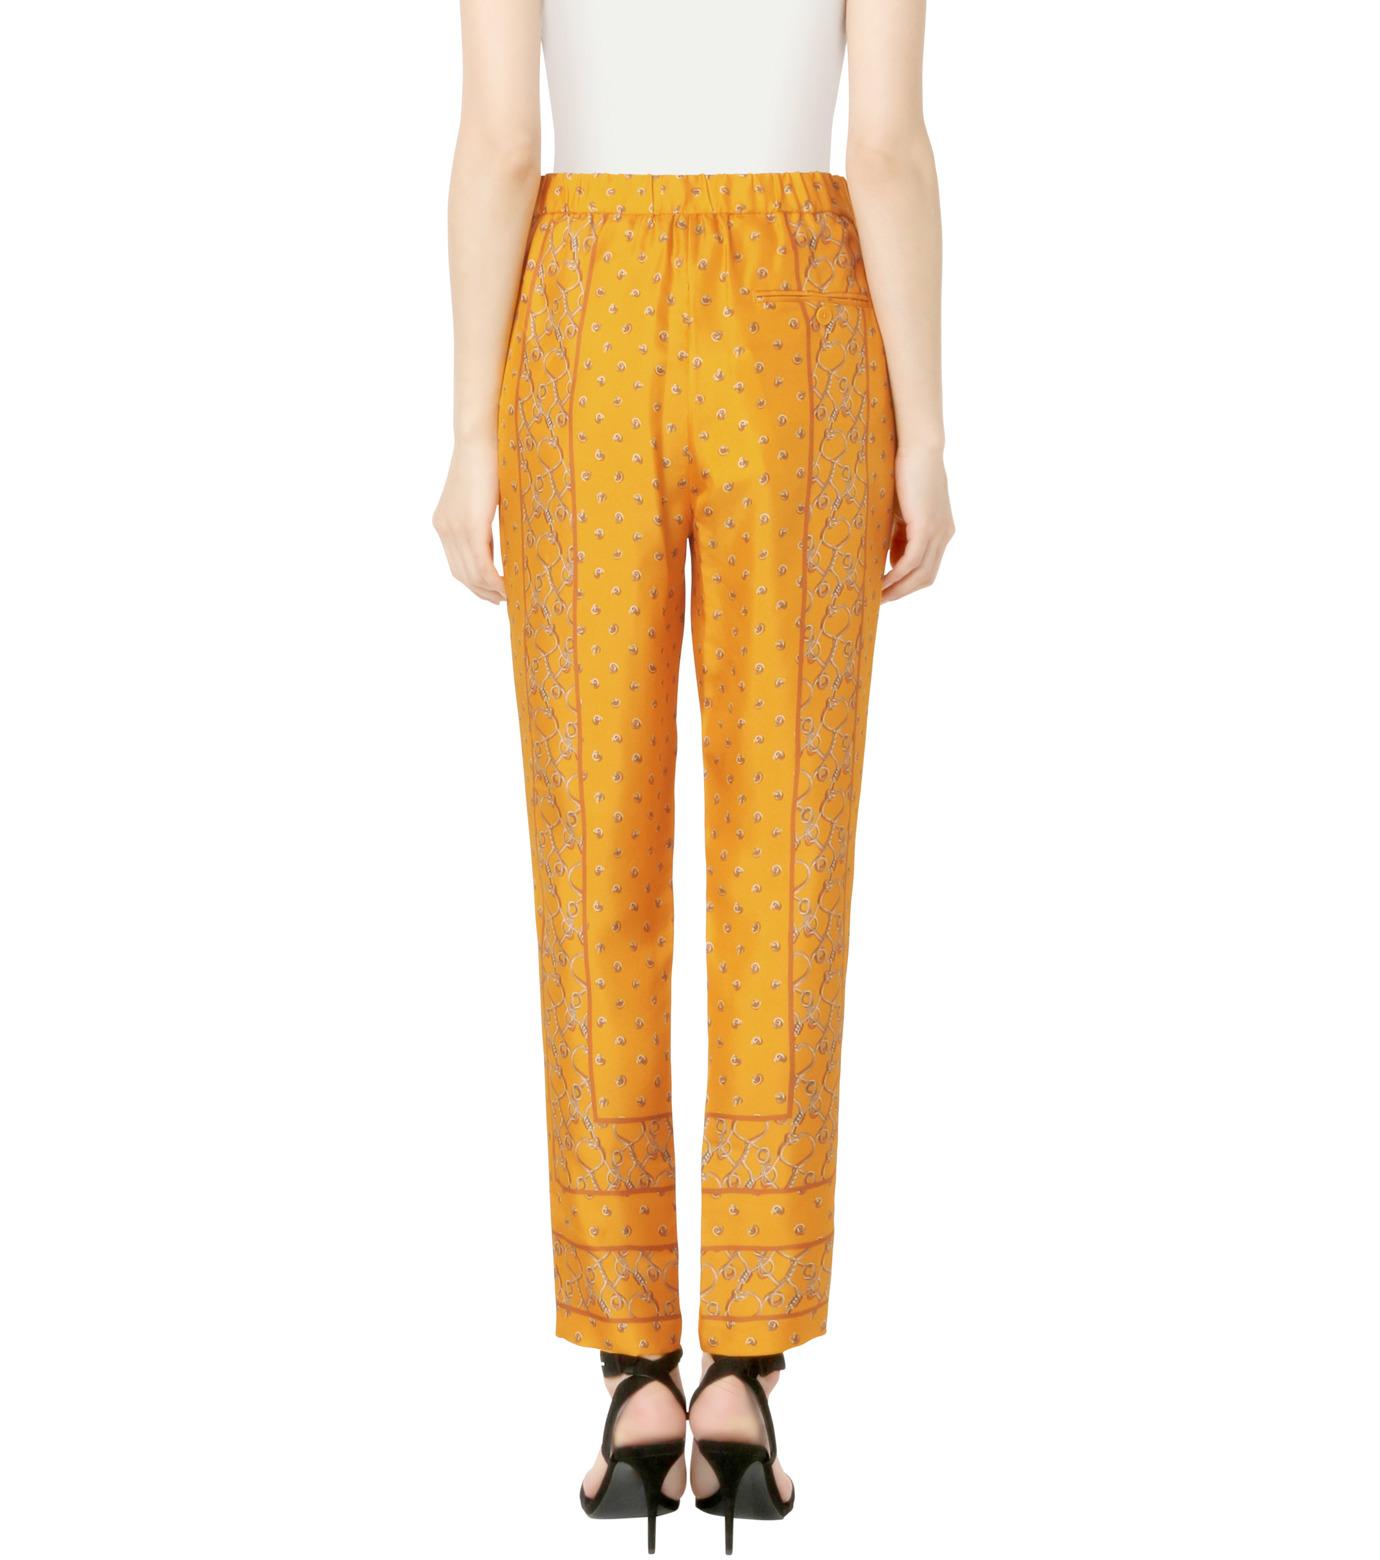 3.1 Phillip Lim(スリーワン フィリップリム)のScarf Print Tapered Trouser-YELLOW(パンツ/pants)-P161-5447BKP-32 拡大詳細画像2